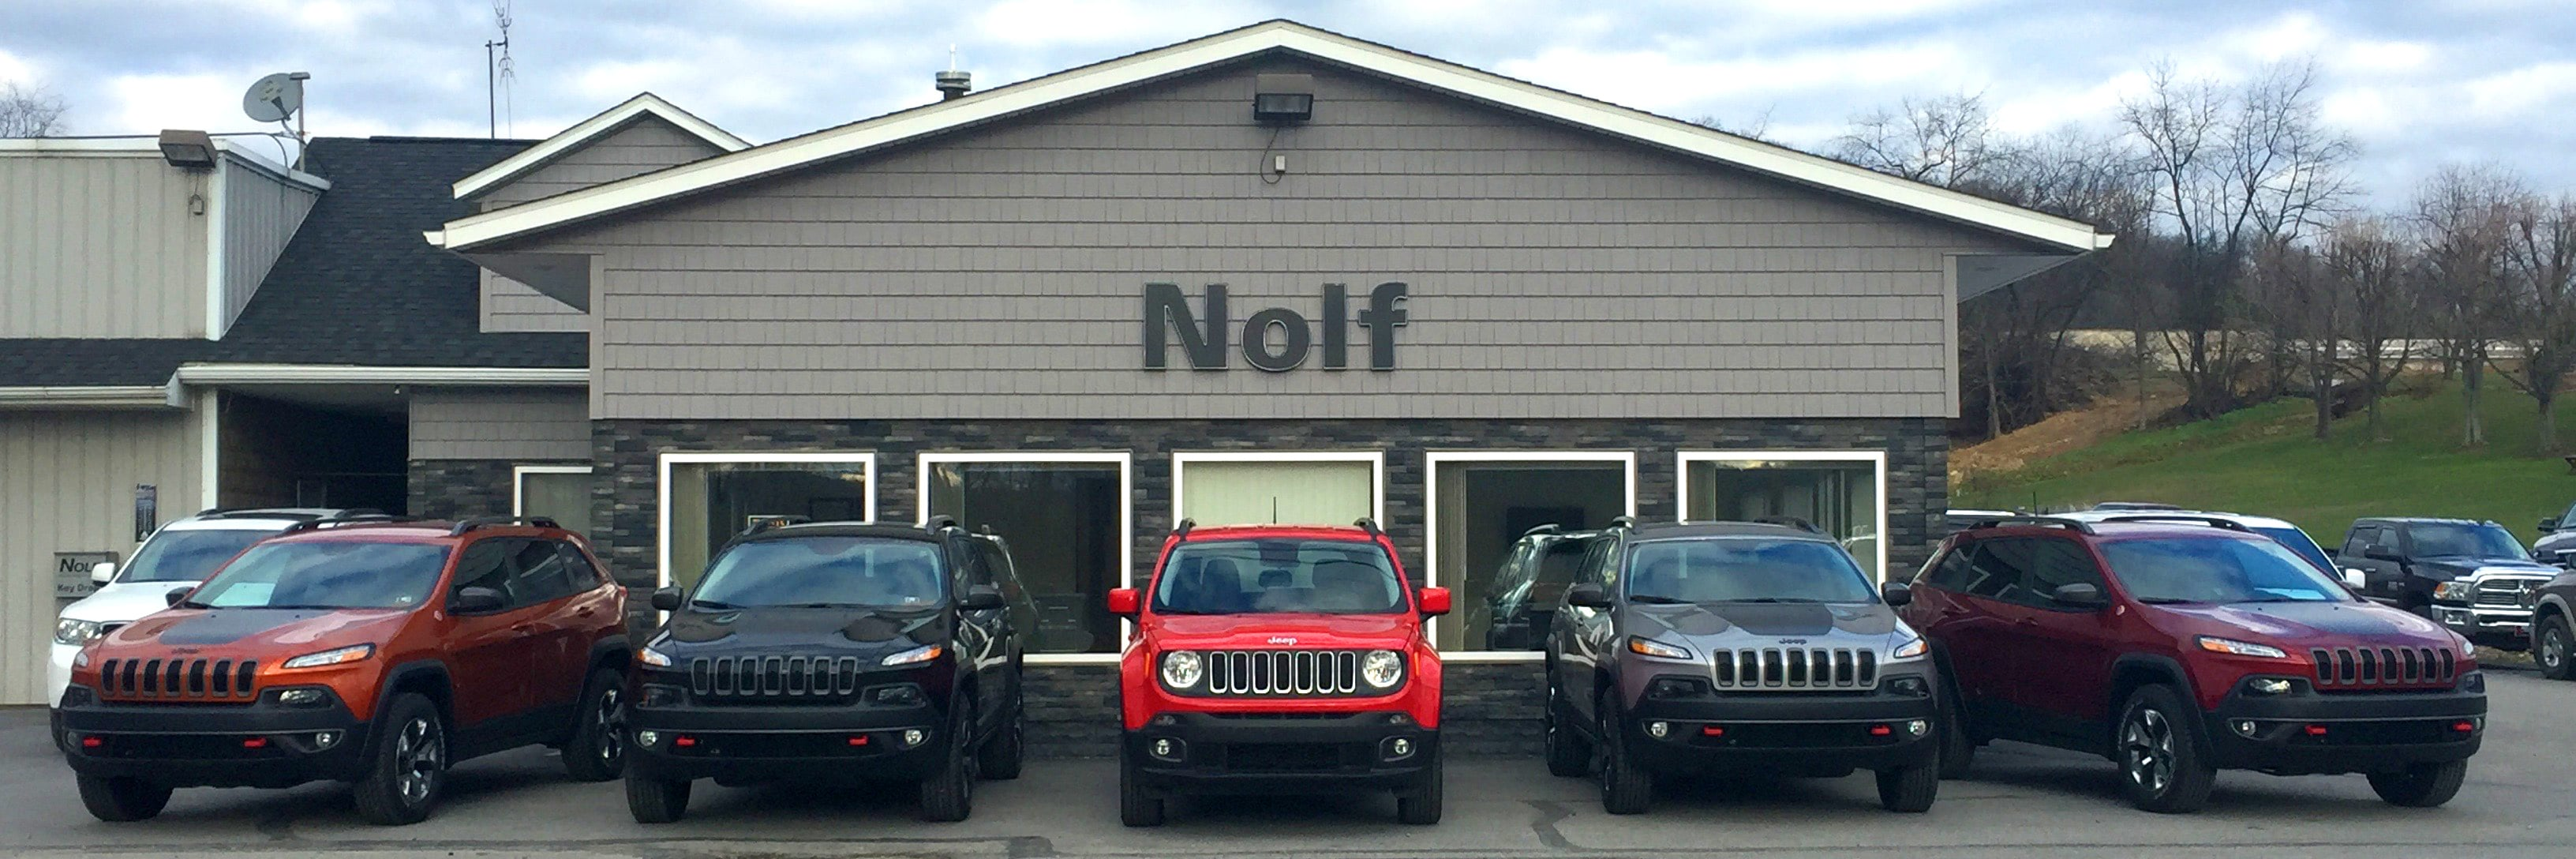 Nolf Chrysler Dodge New Chrysler Dodge Jeep Ram